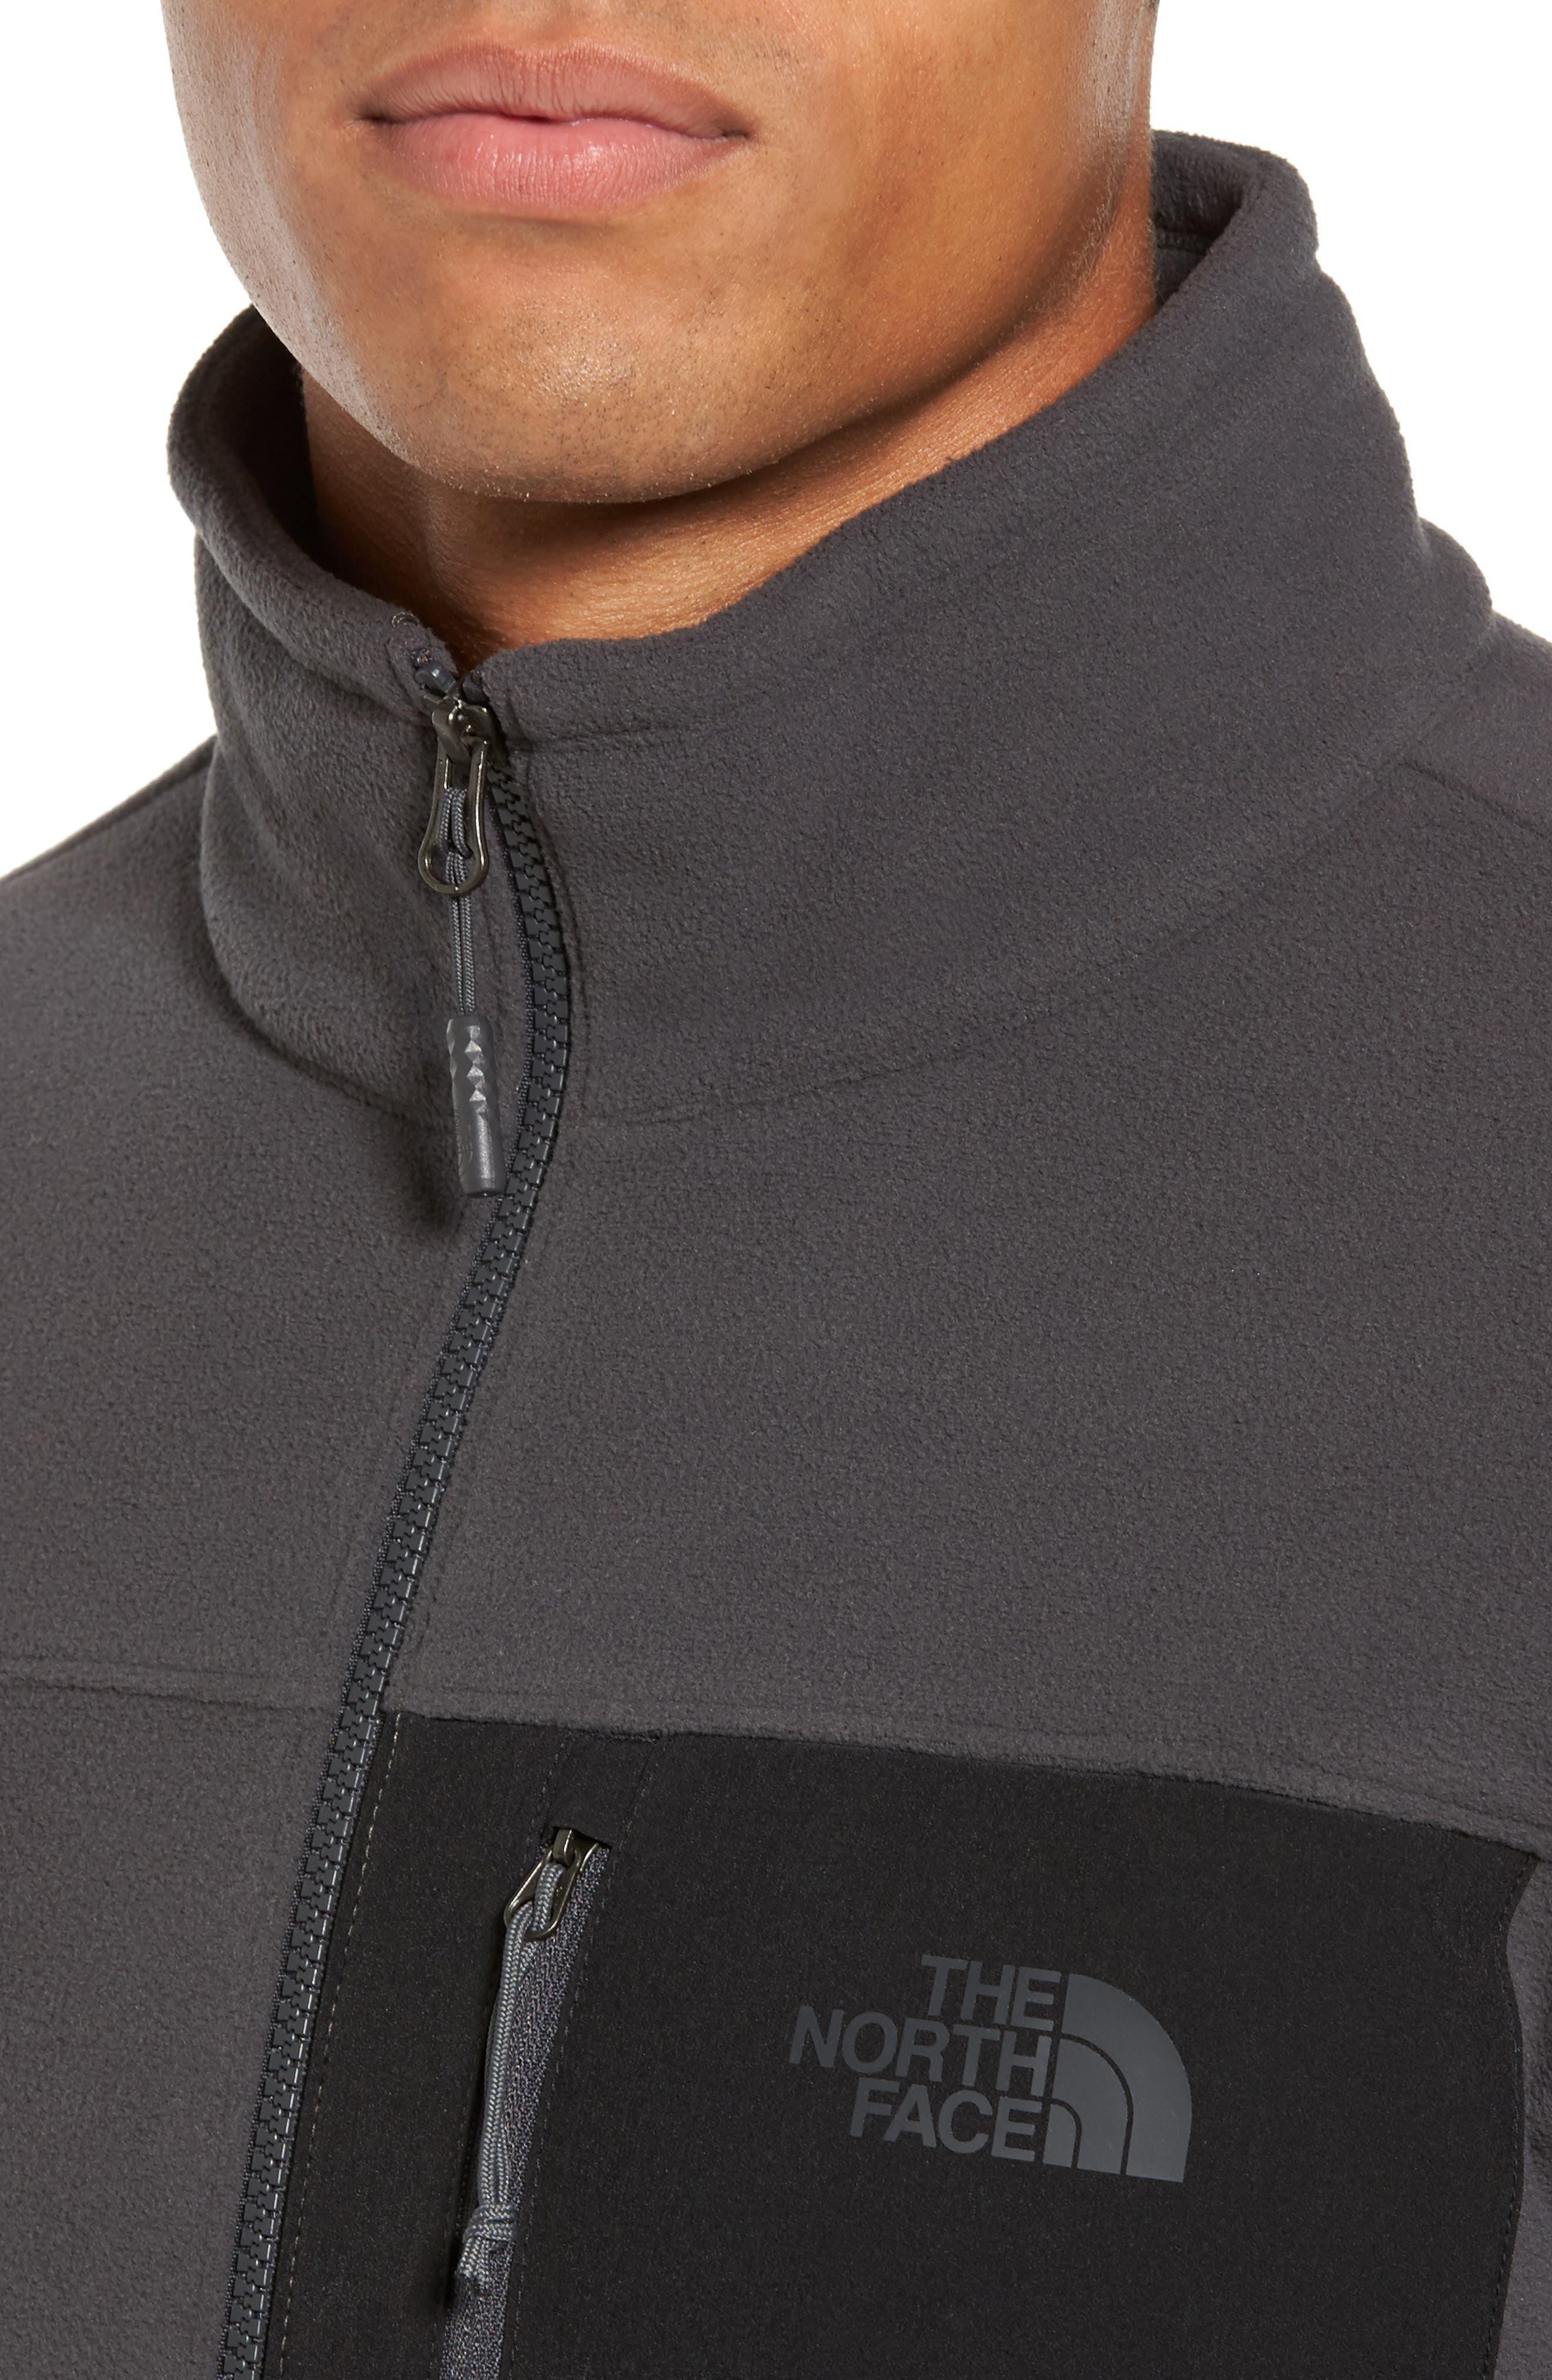 'Chimborazo' Zip Front Fleece Jacket,                             Alternate thumbnail 32, color,